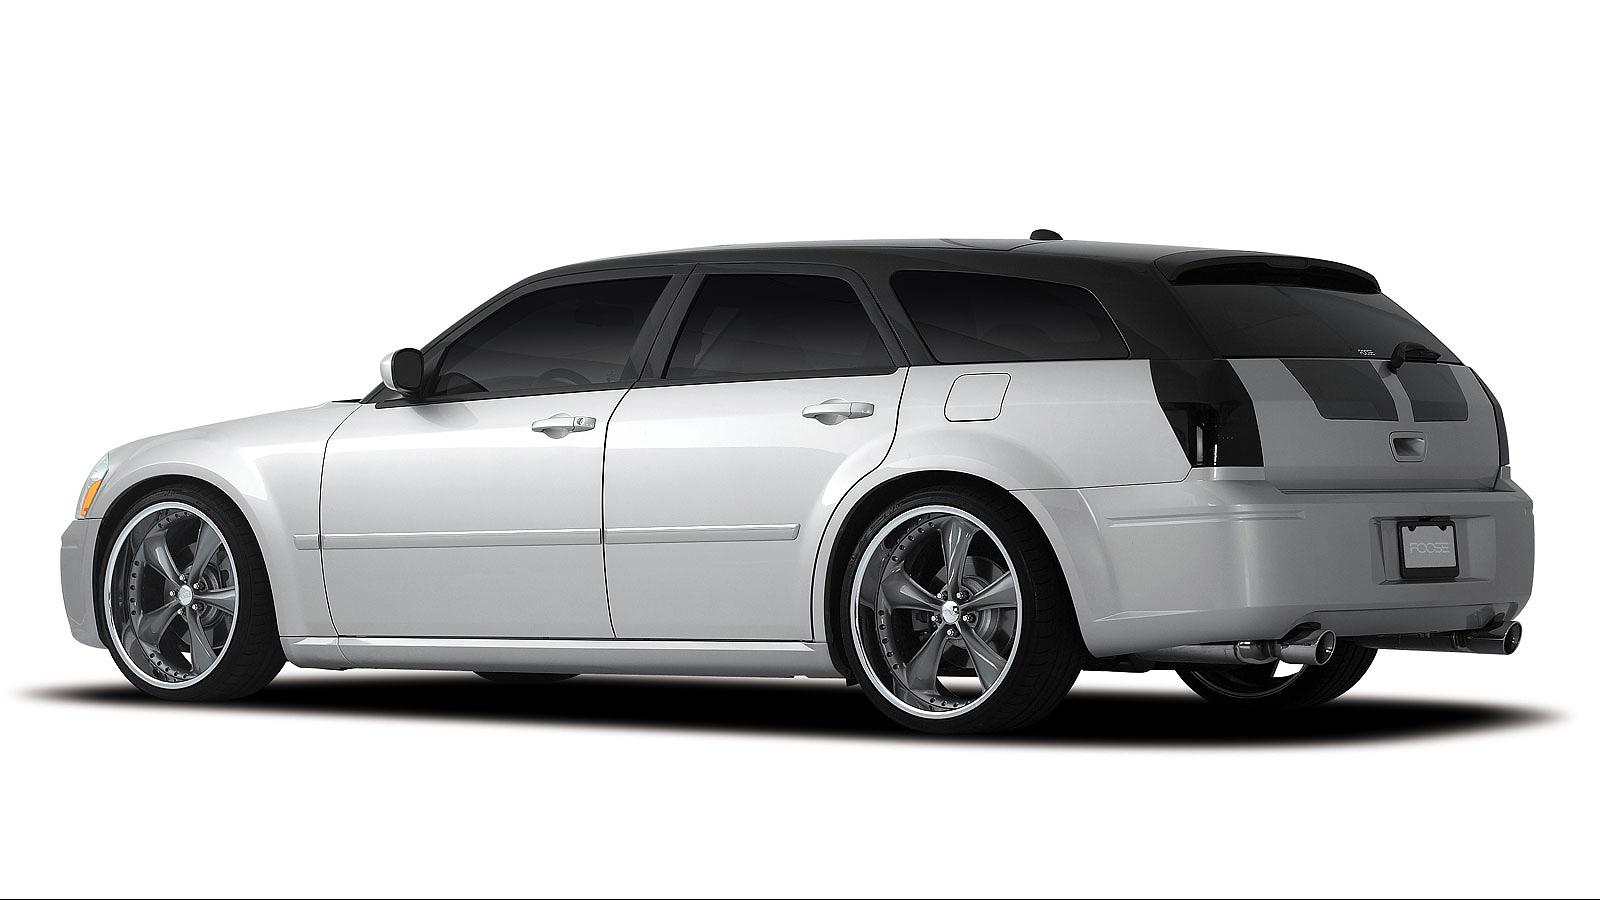 Dodge Magnum Nitrous SE - F300 Gallery - MHT Wheels Inc.